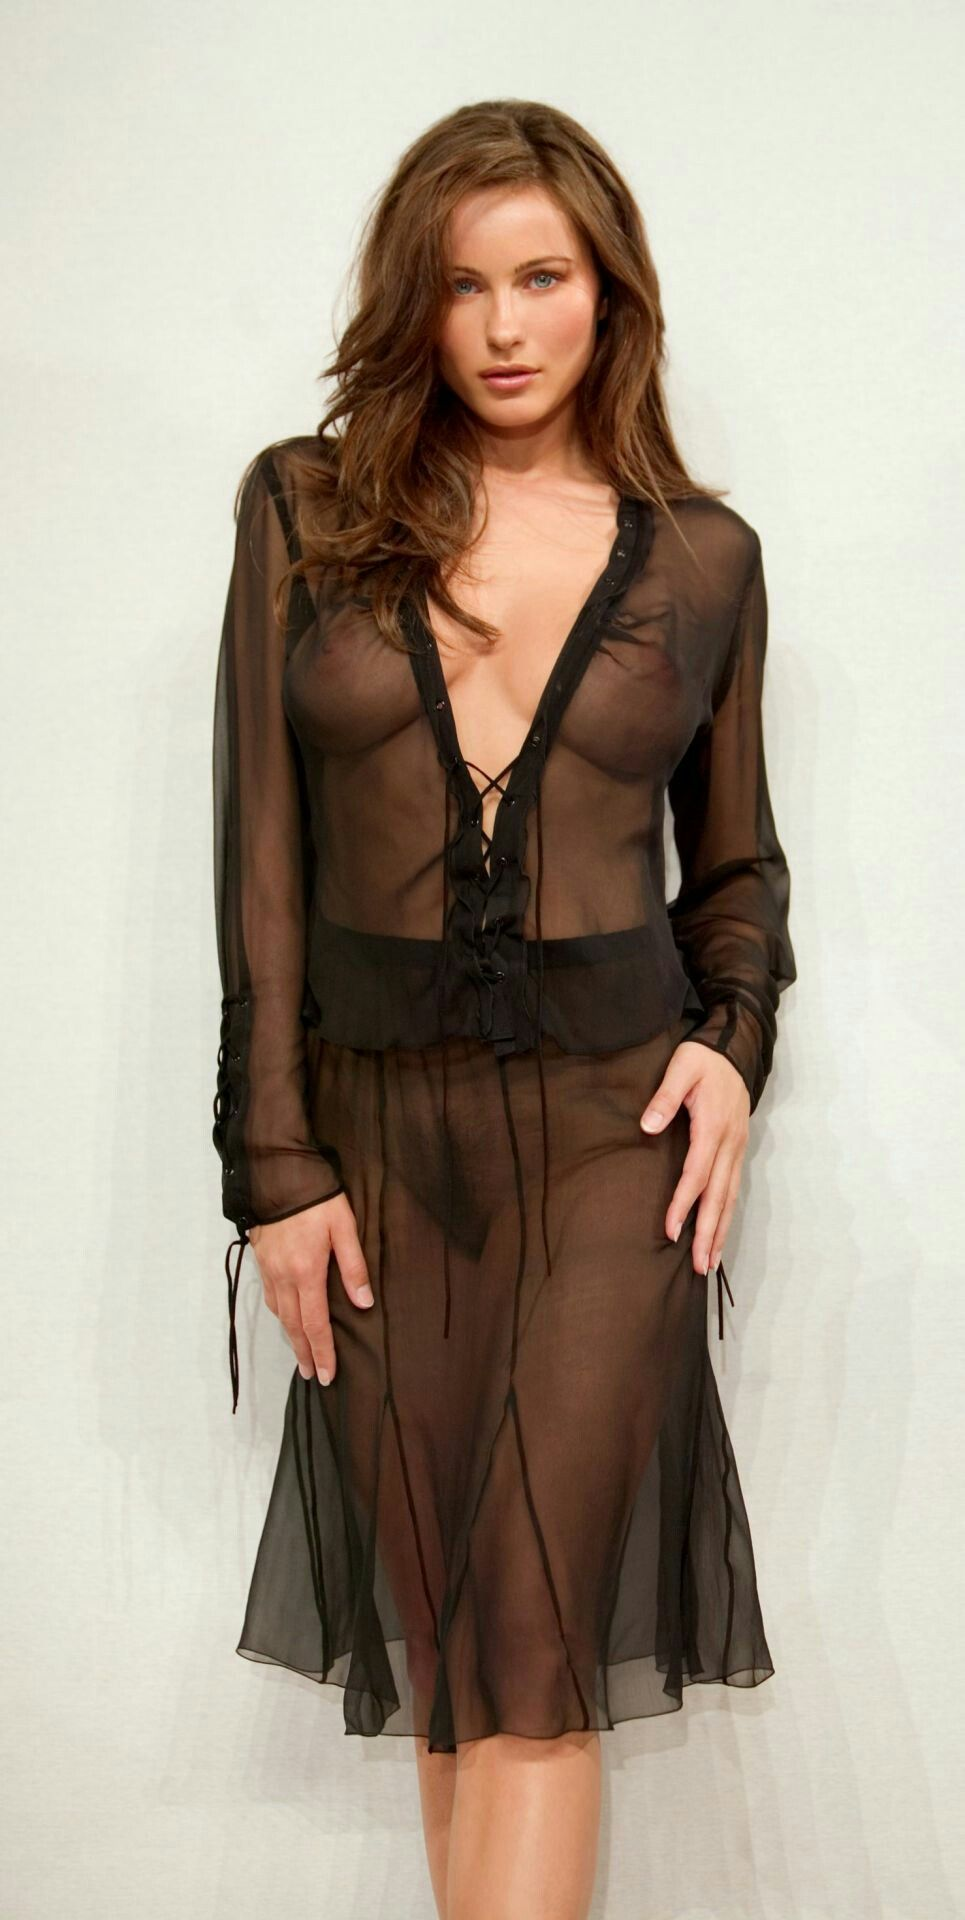 Black sexy nightwear shirt dress sheer women lingerie